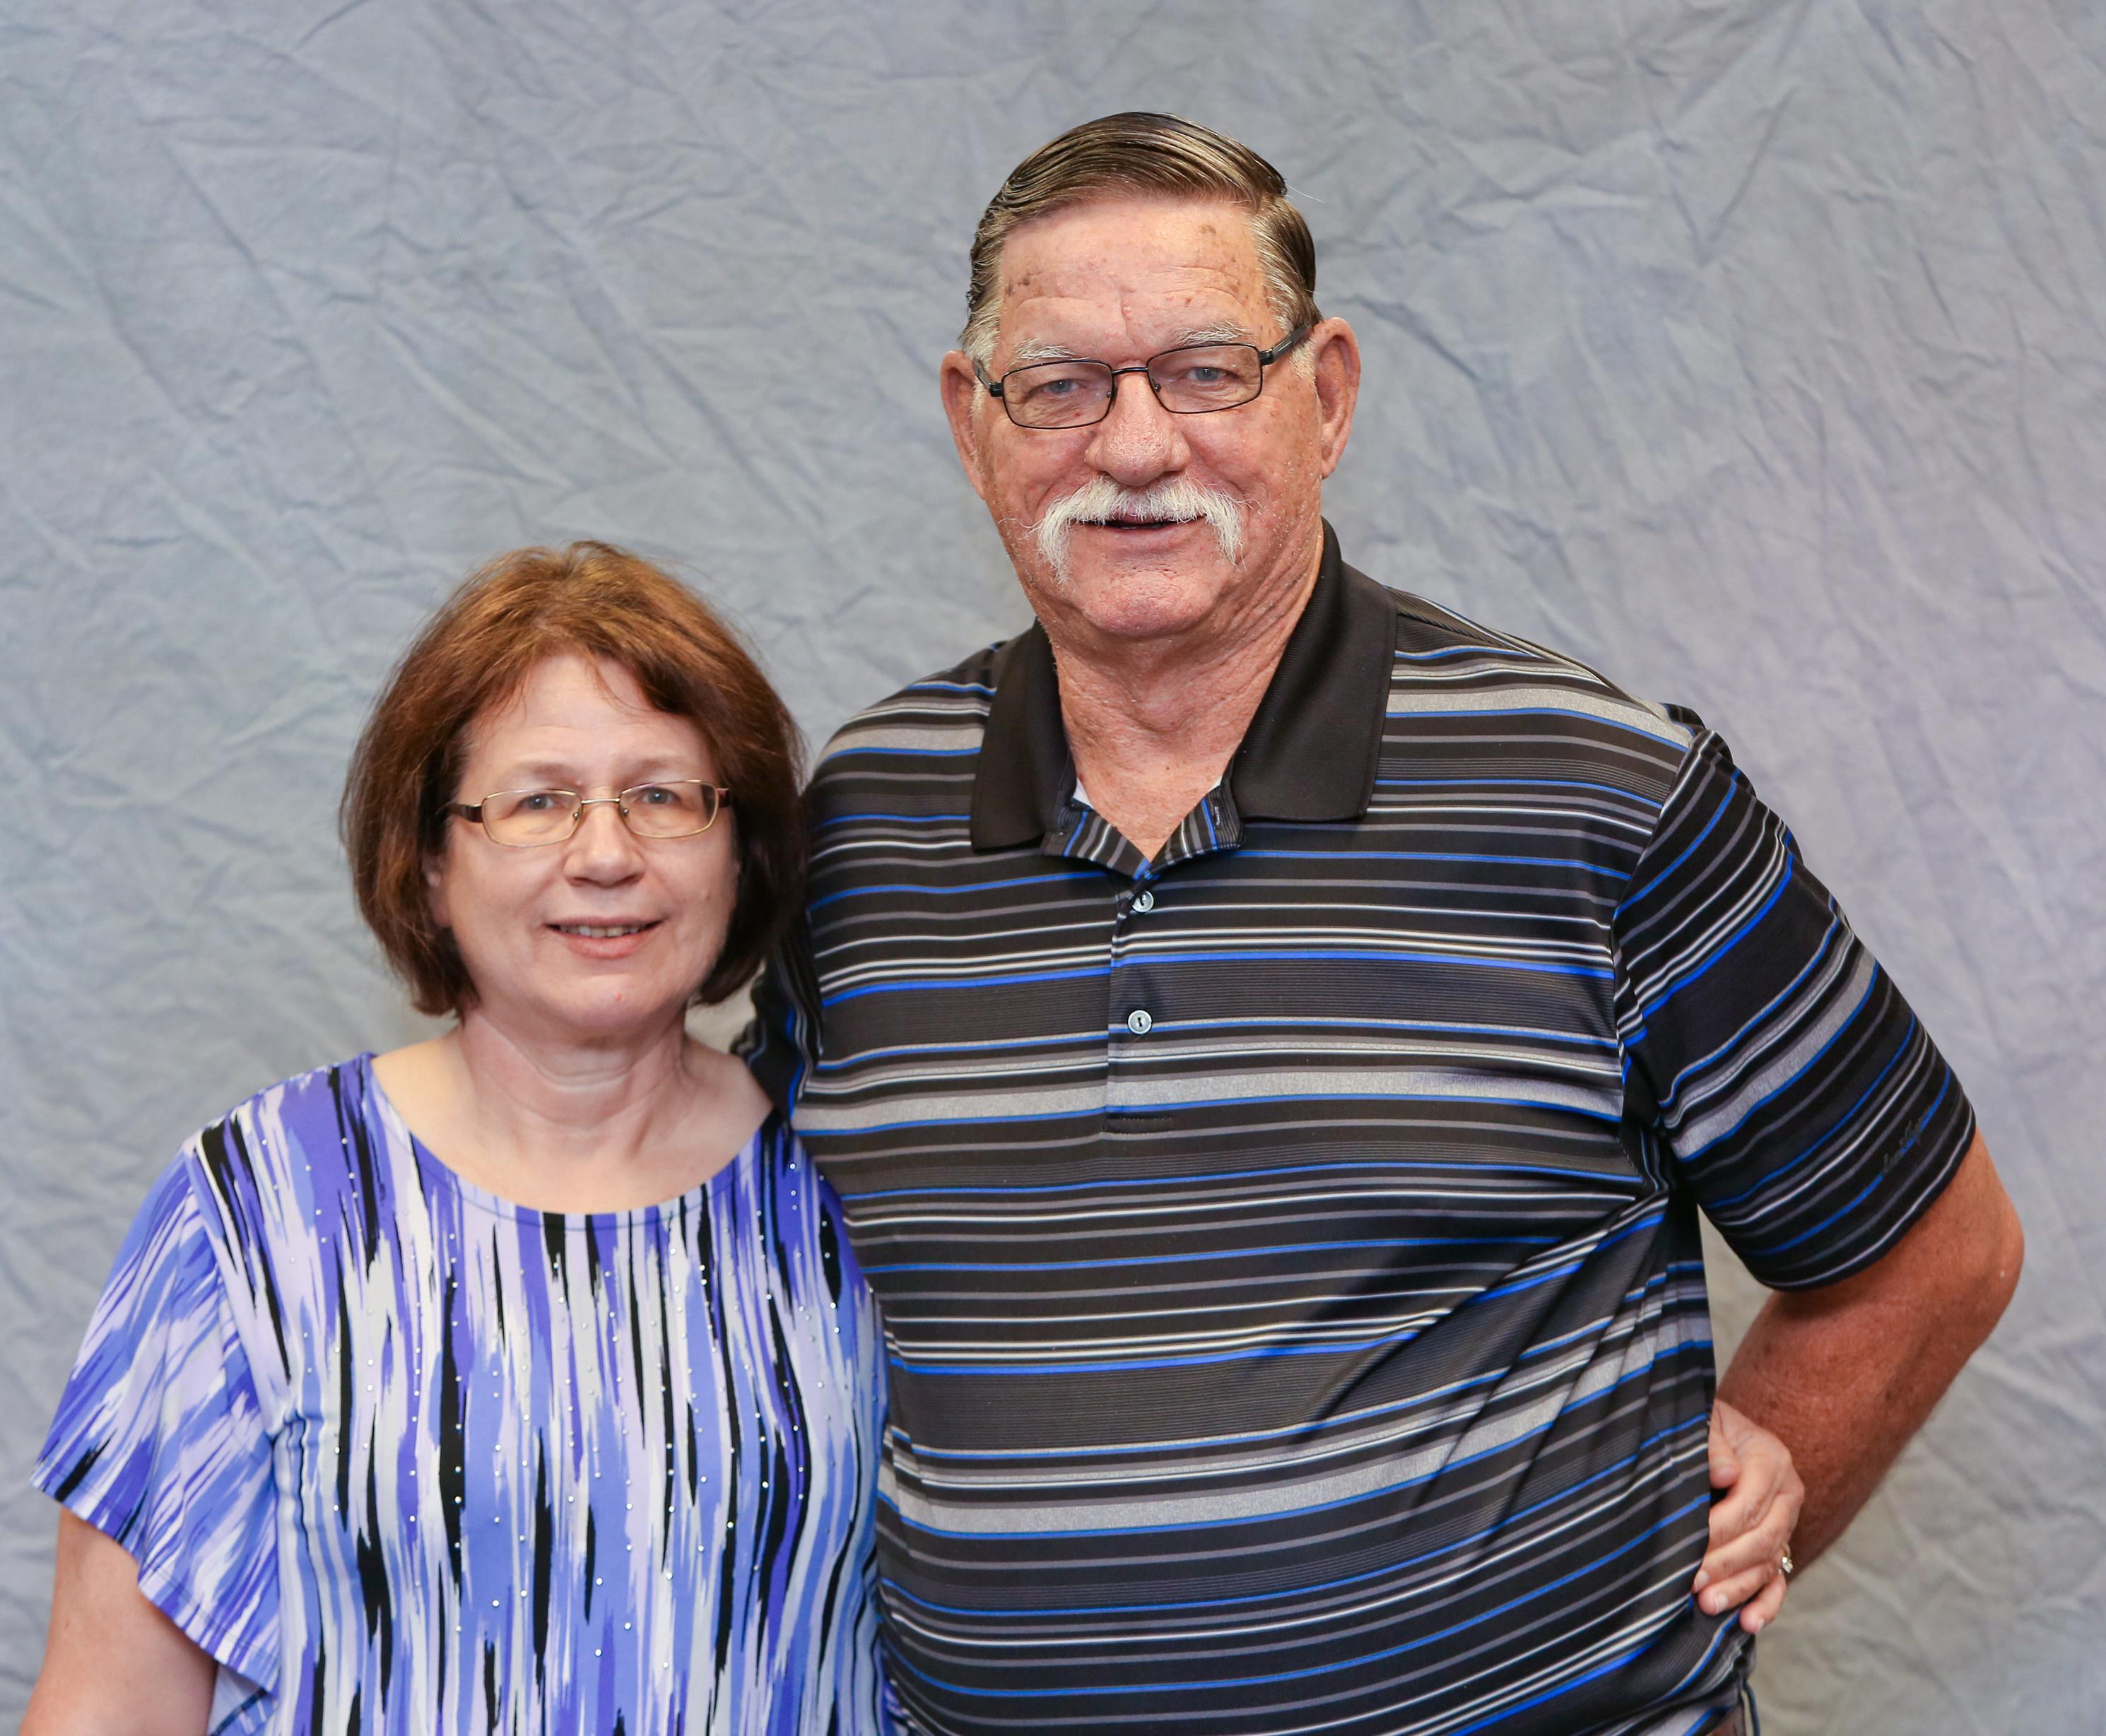 Jim and Sharon Solomon – Galilean Baptist Church in Fairmont, WV